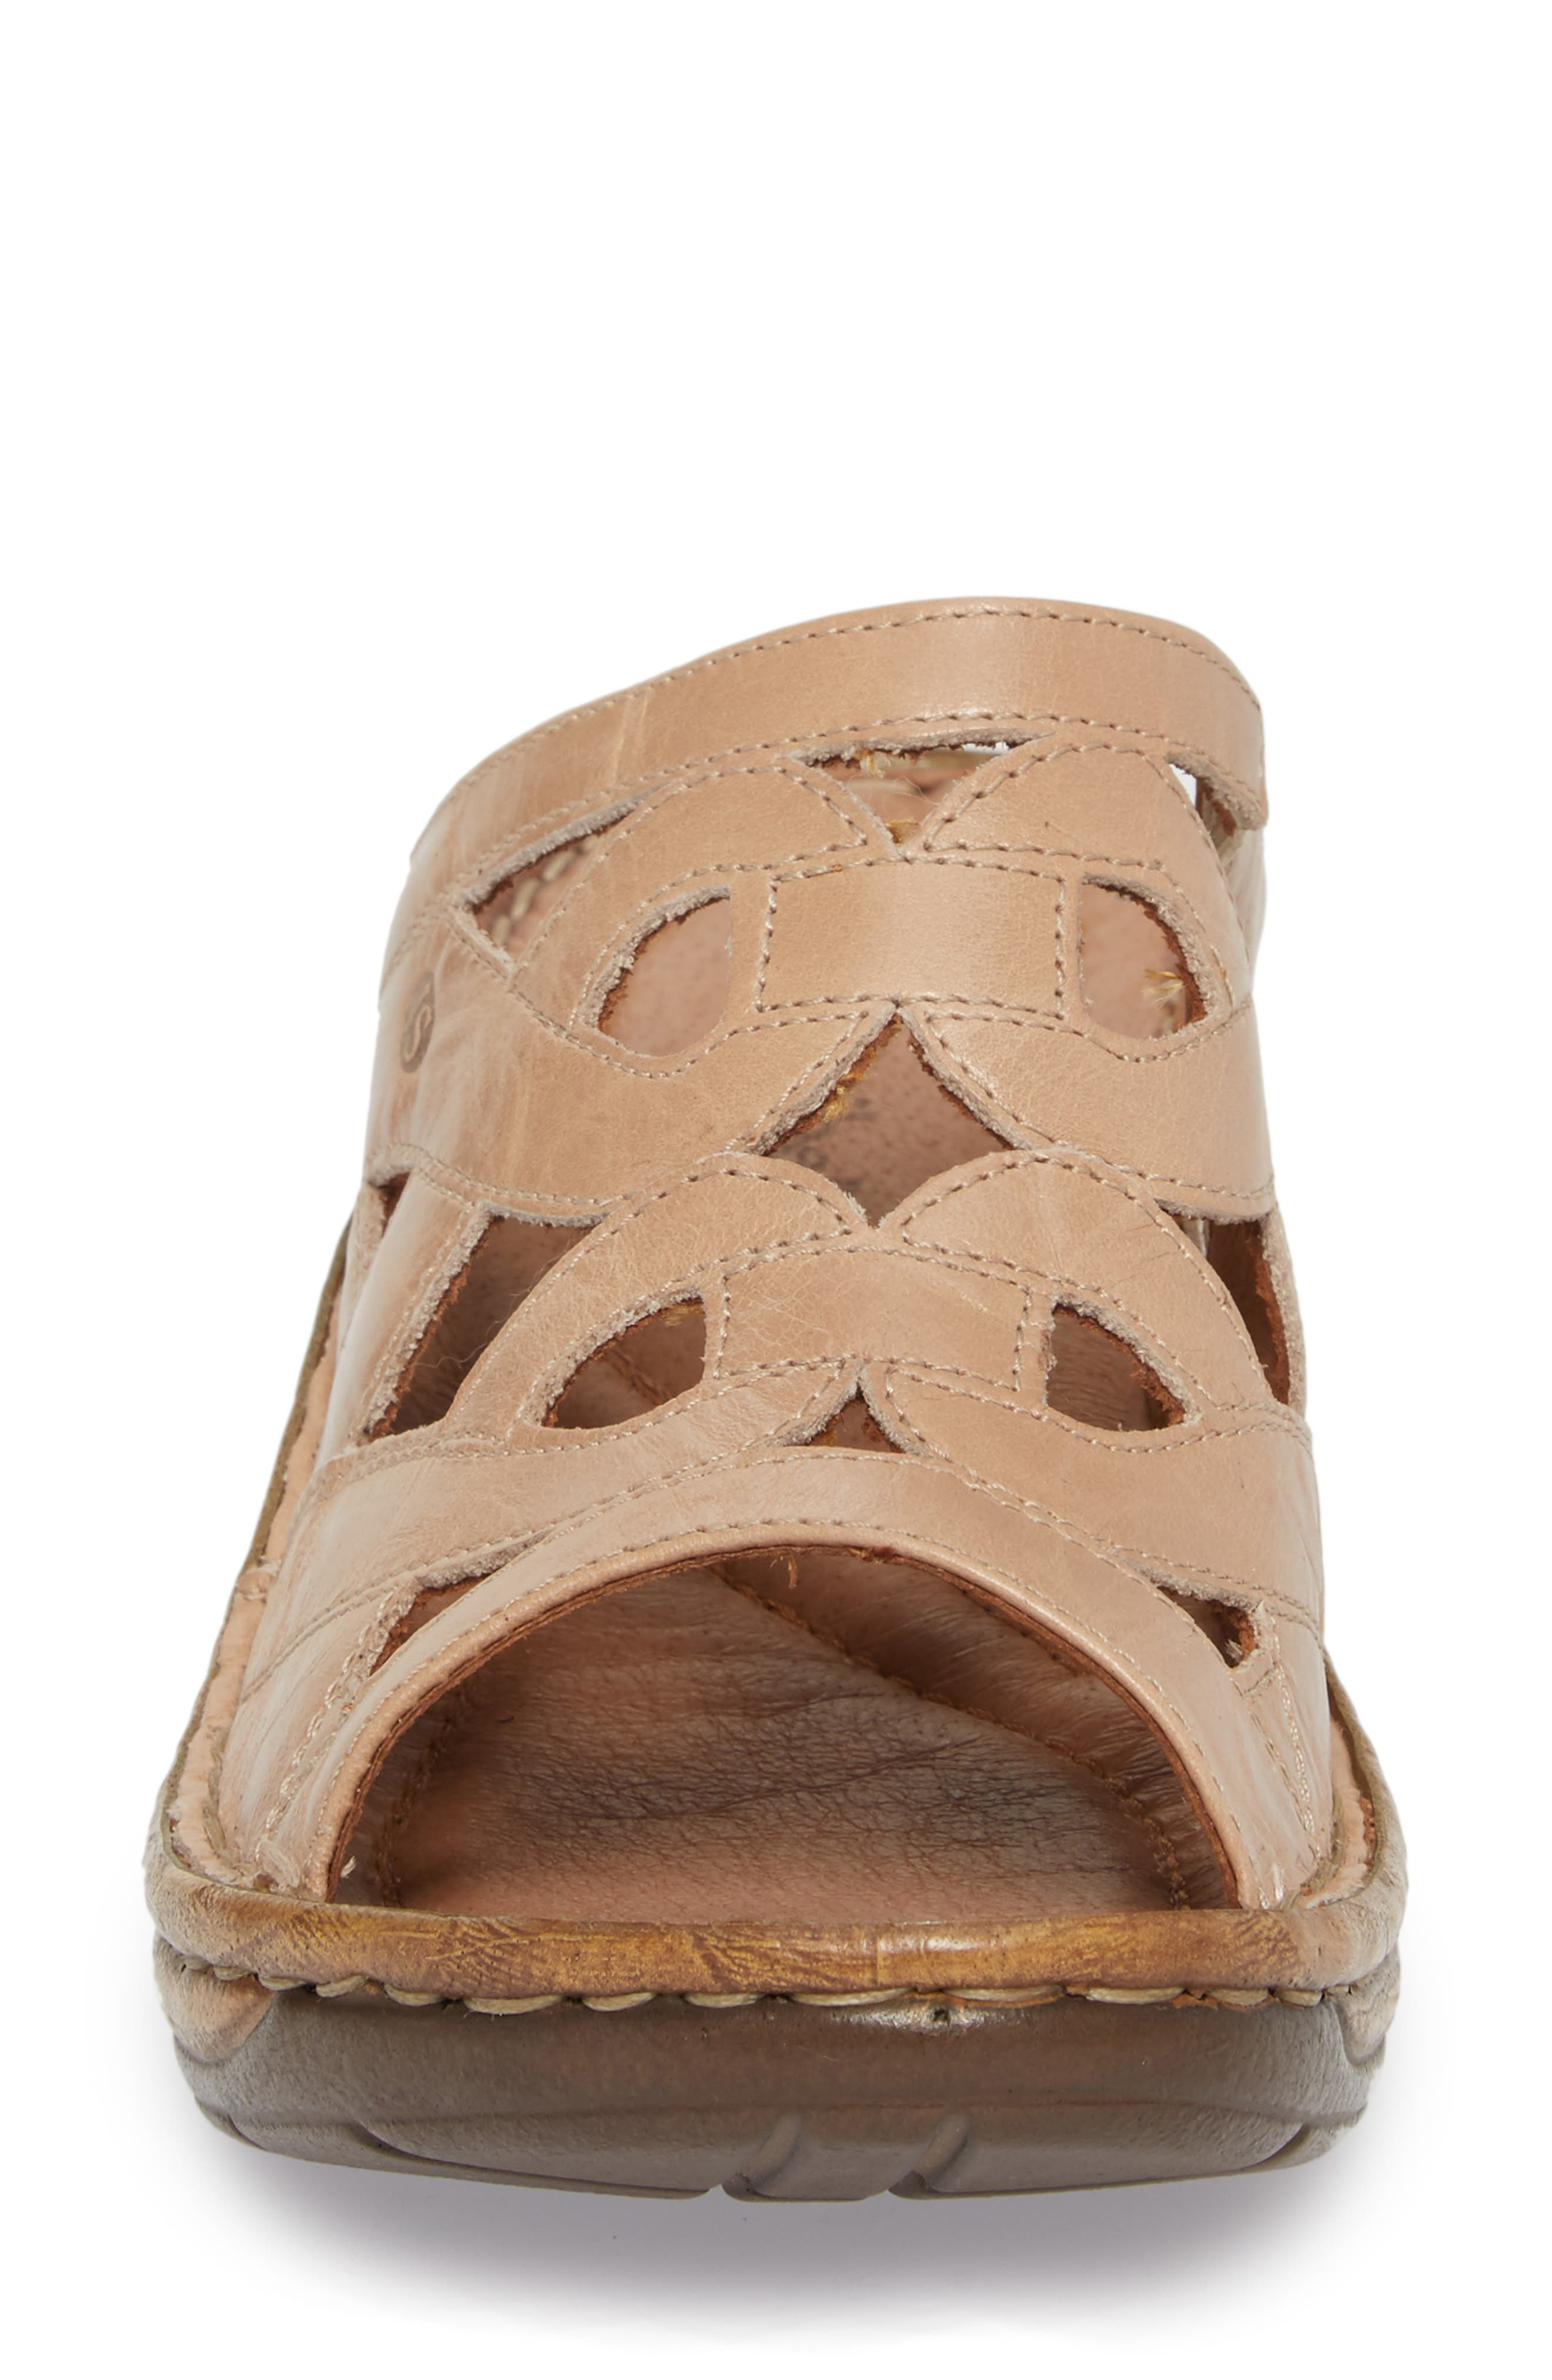 Catalonia 44 Slide Sandal,                             Alternate thumbnail 4, color,                             Beige Leather